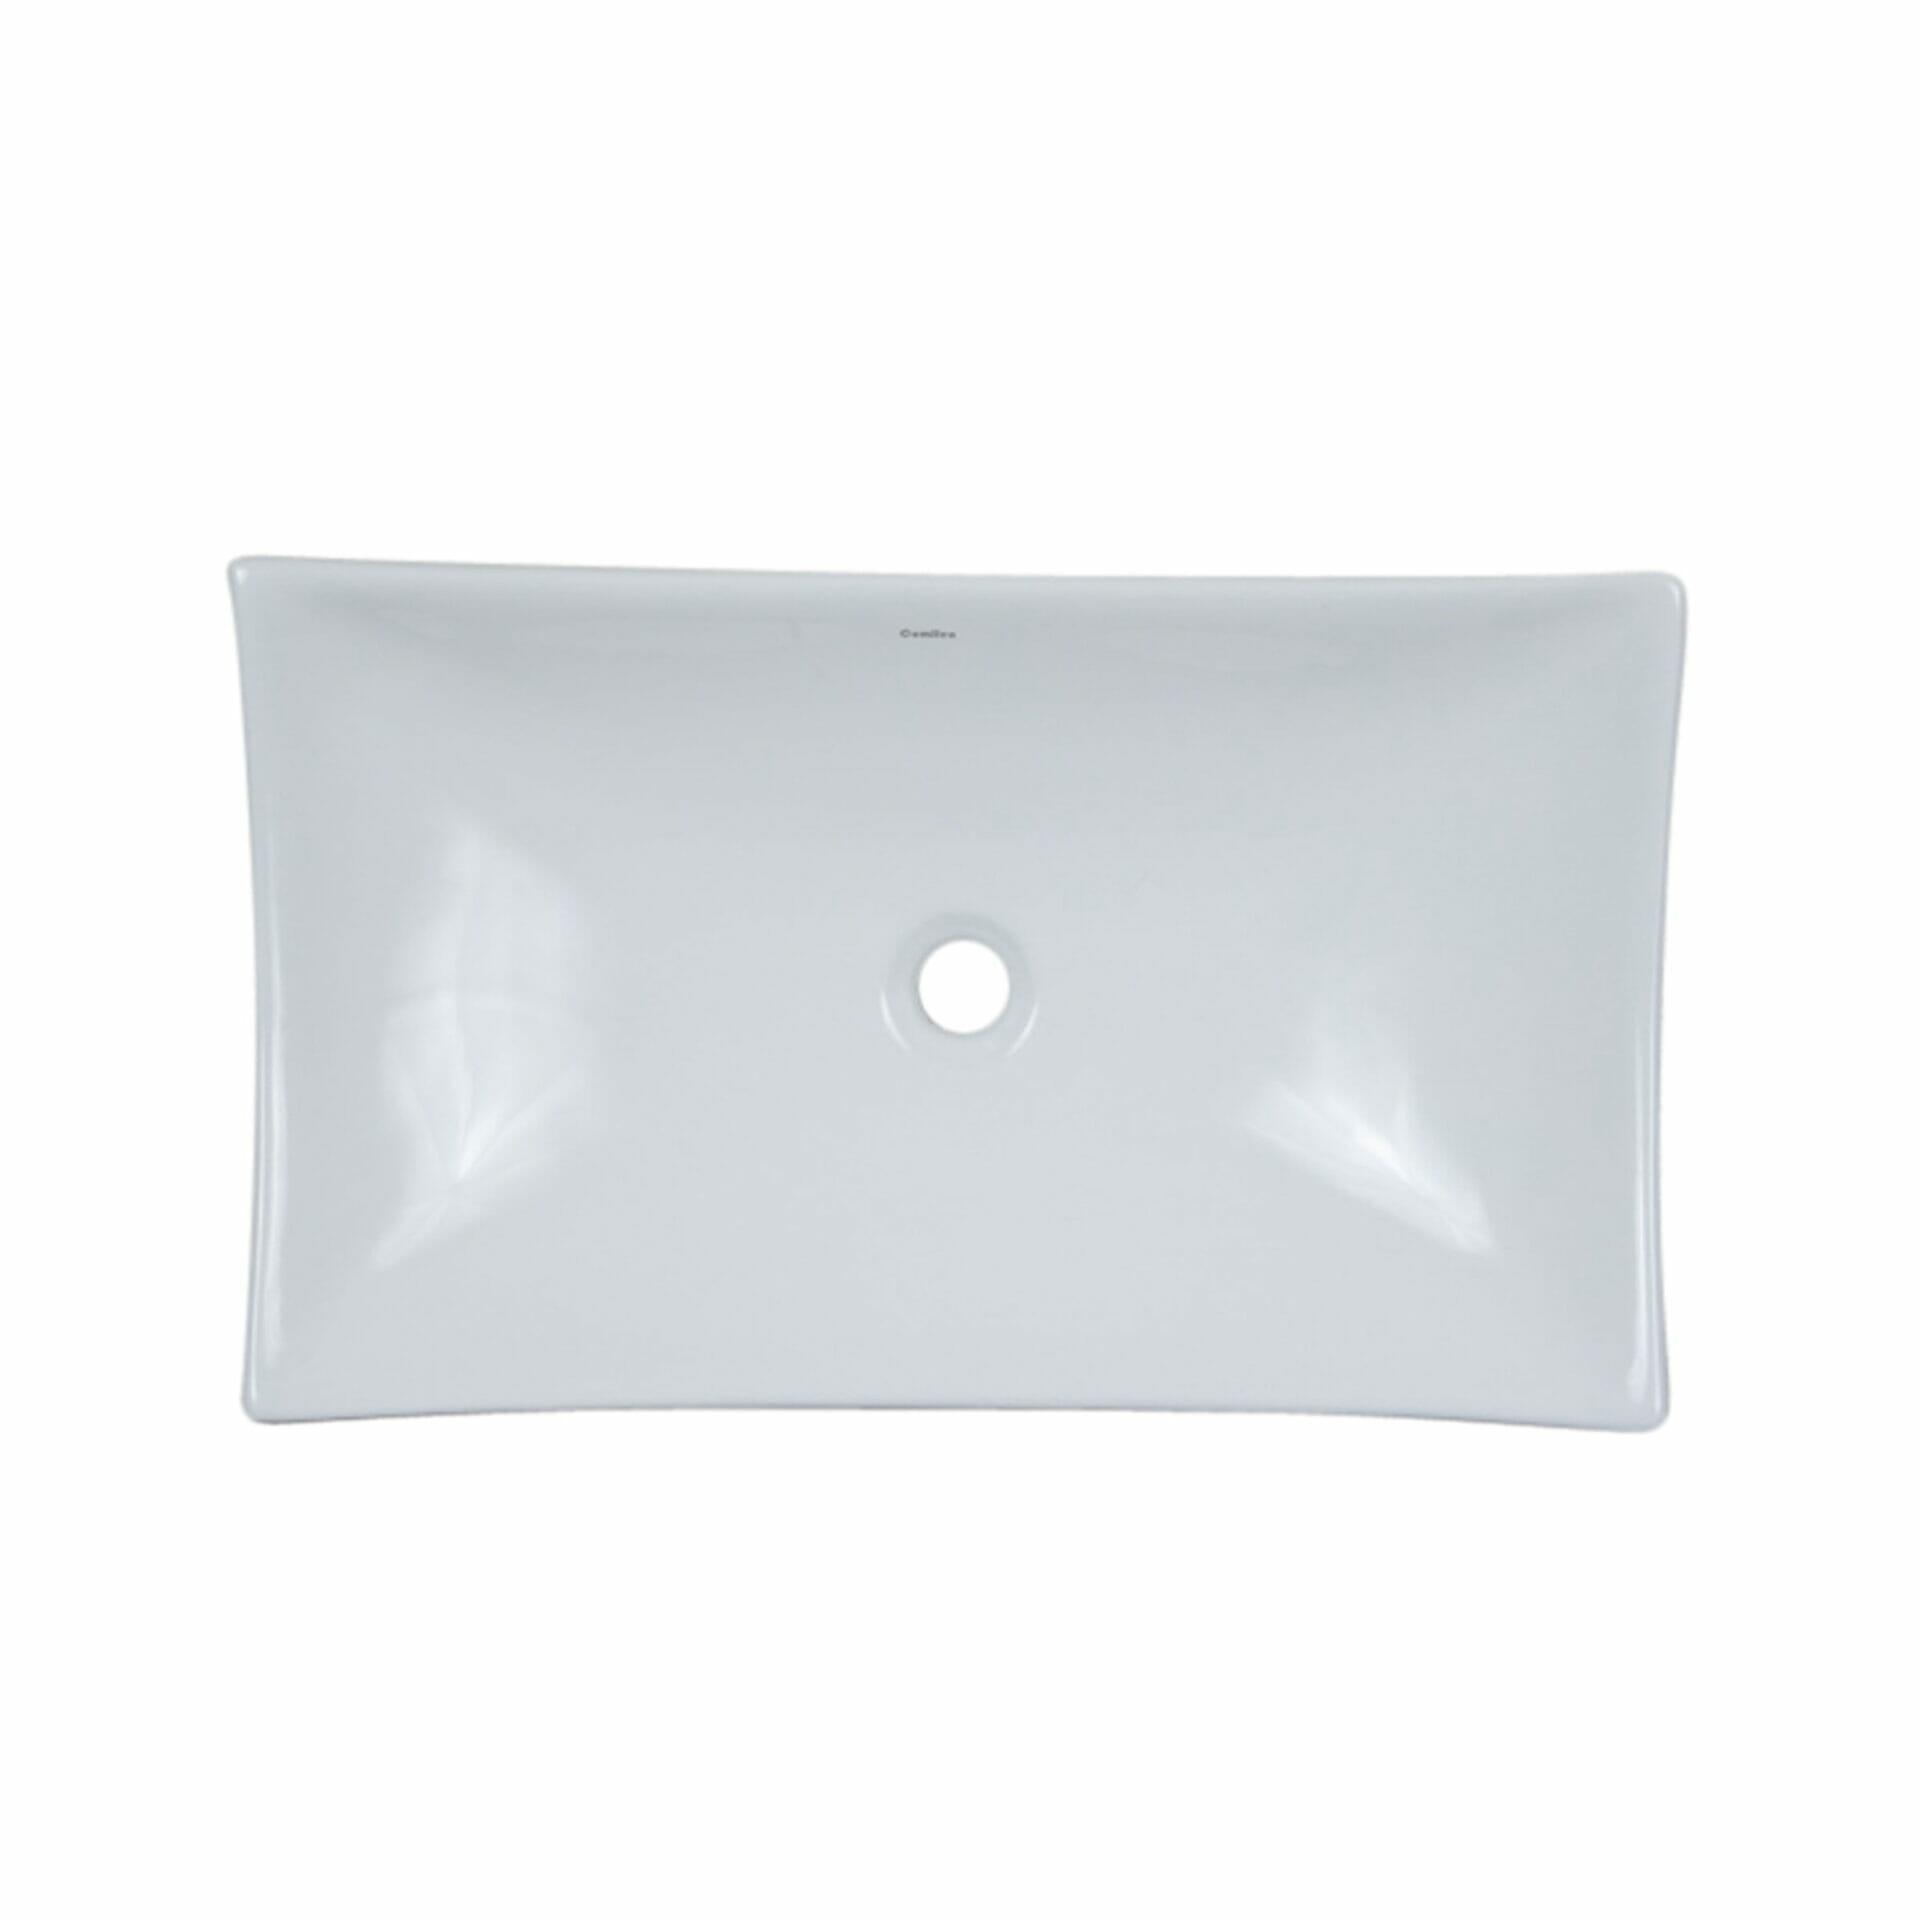 Large Rectangle Vessel Ceramic Sink